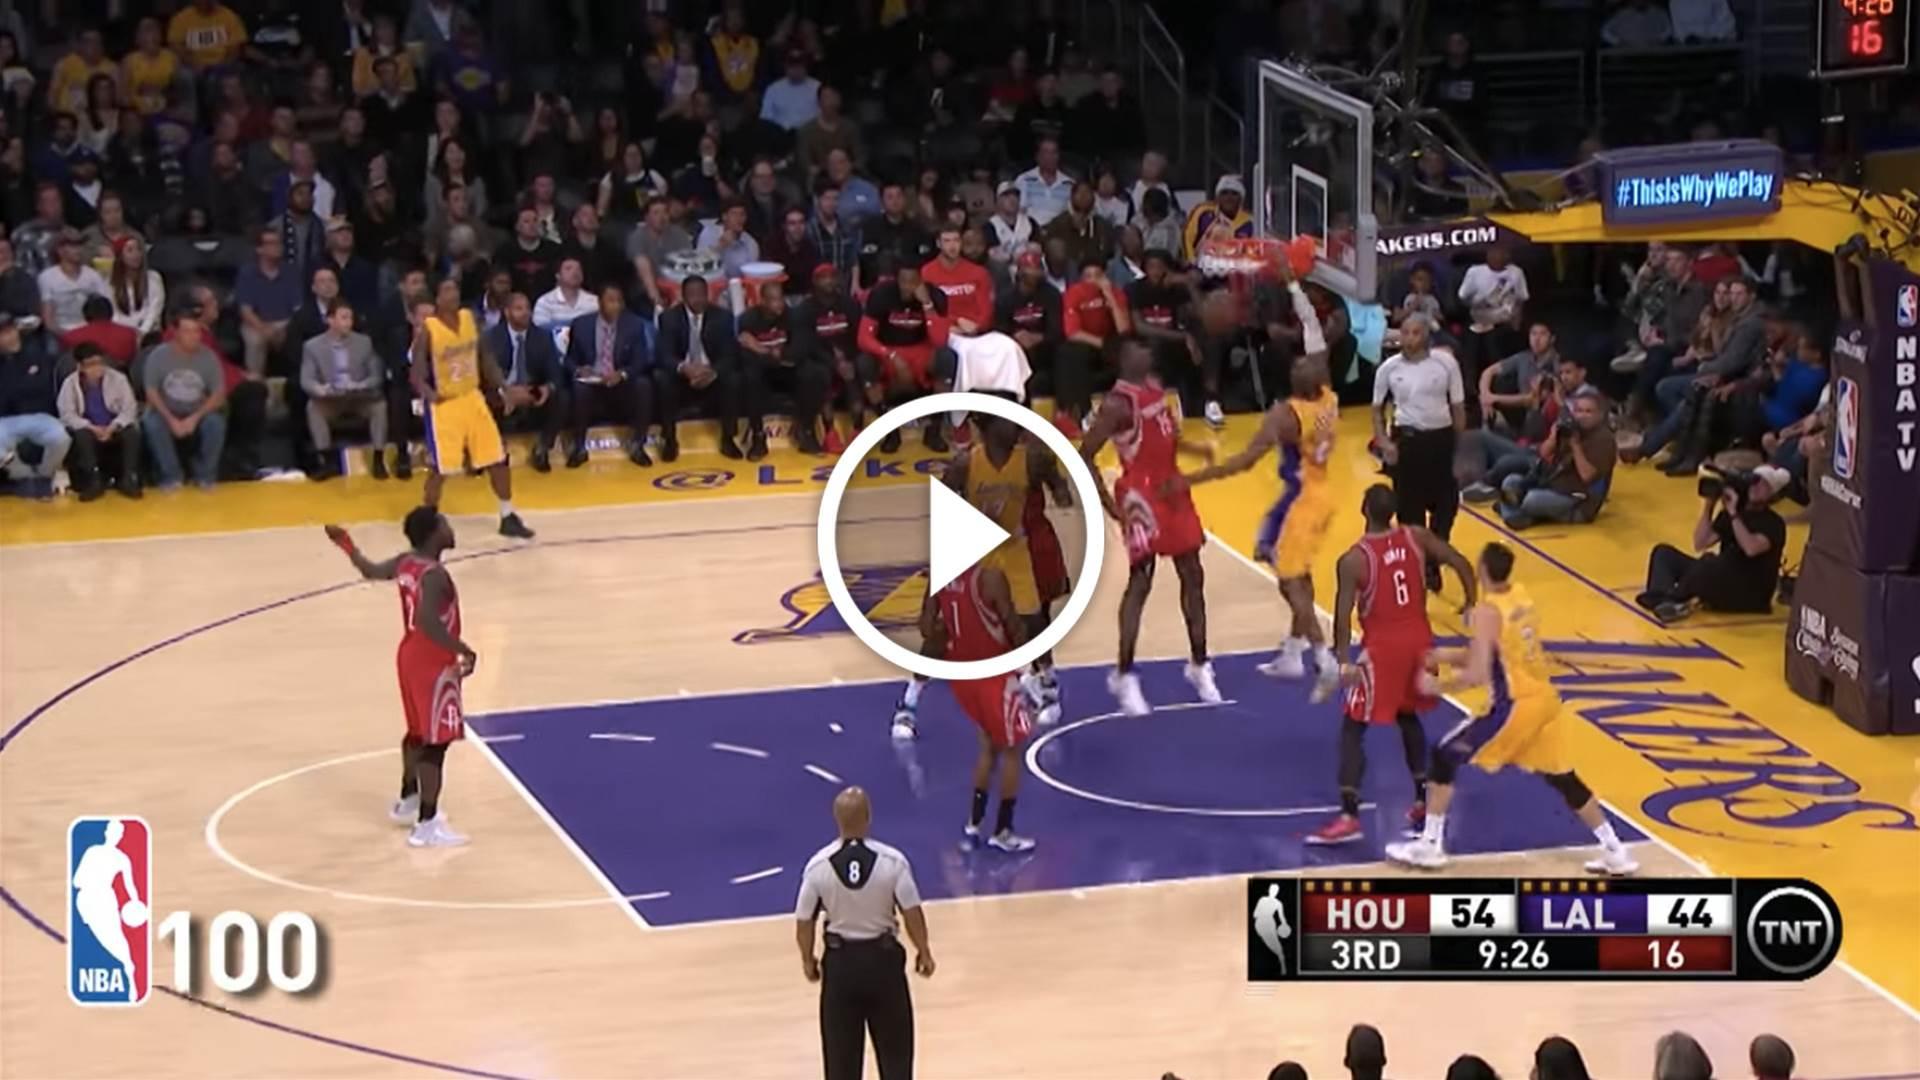 Top 100 plays of the 2016 NBA season